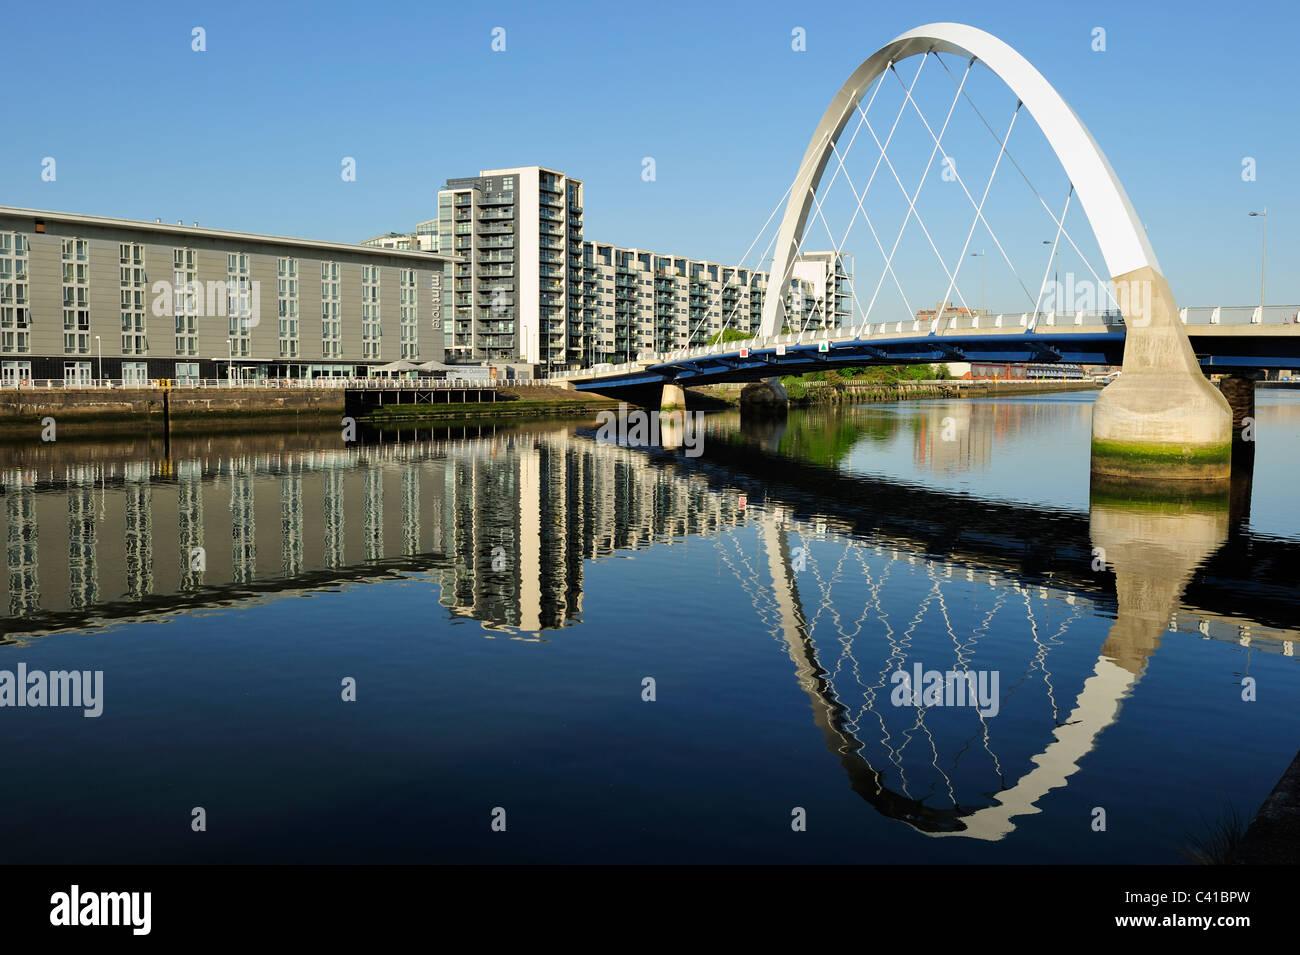 Clyde Arc Bridge at Finnieston, Glasgow, Scotland - Stock Image